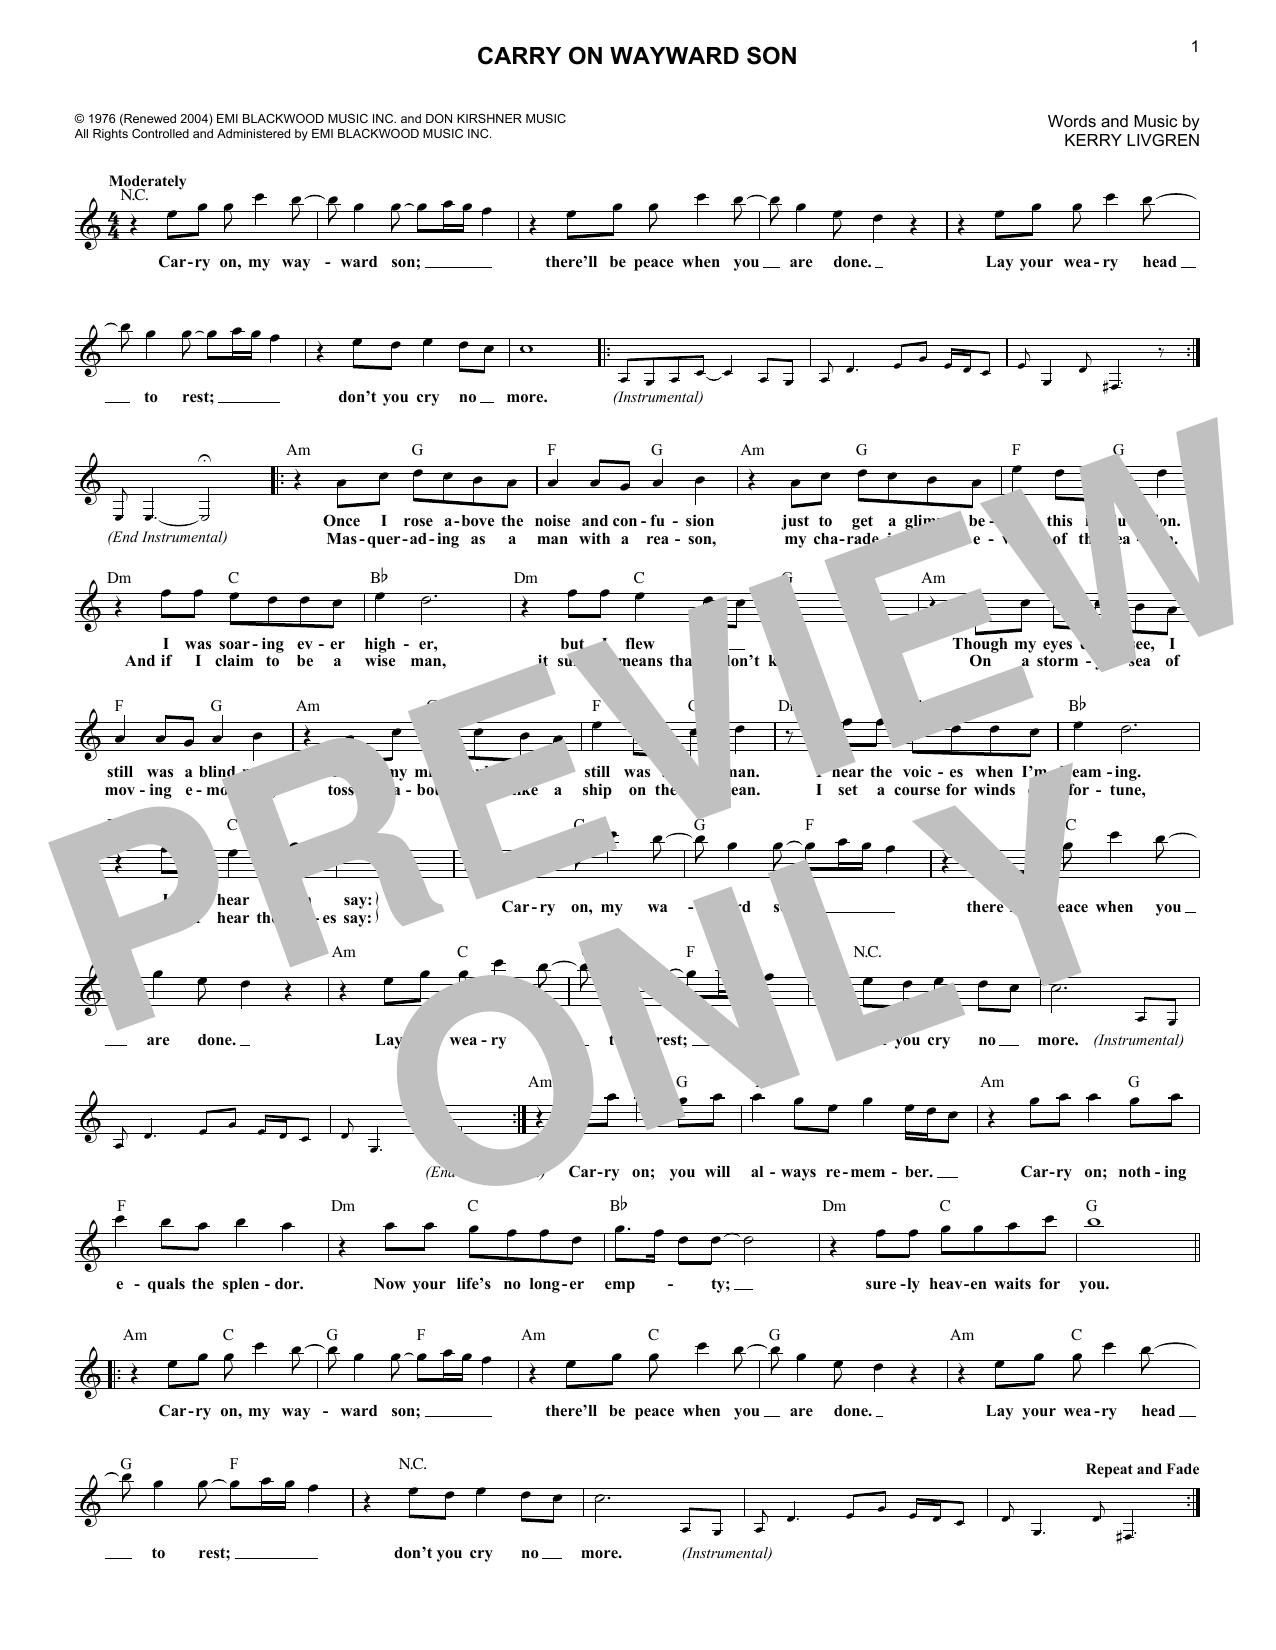 Sheet Music Digital Files To Print Licensed Kerry Livgren Digital